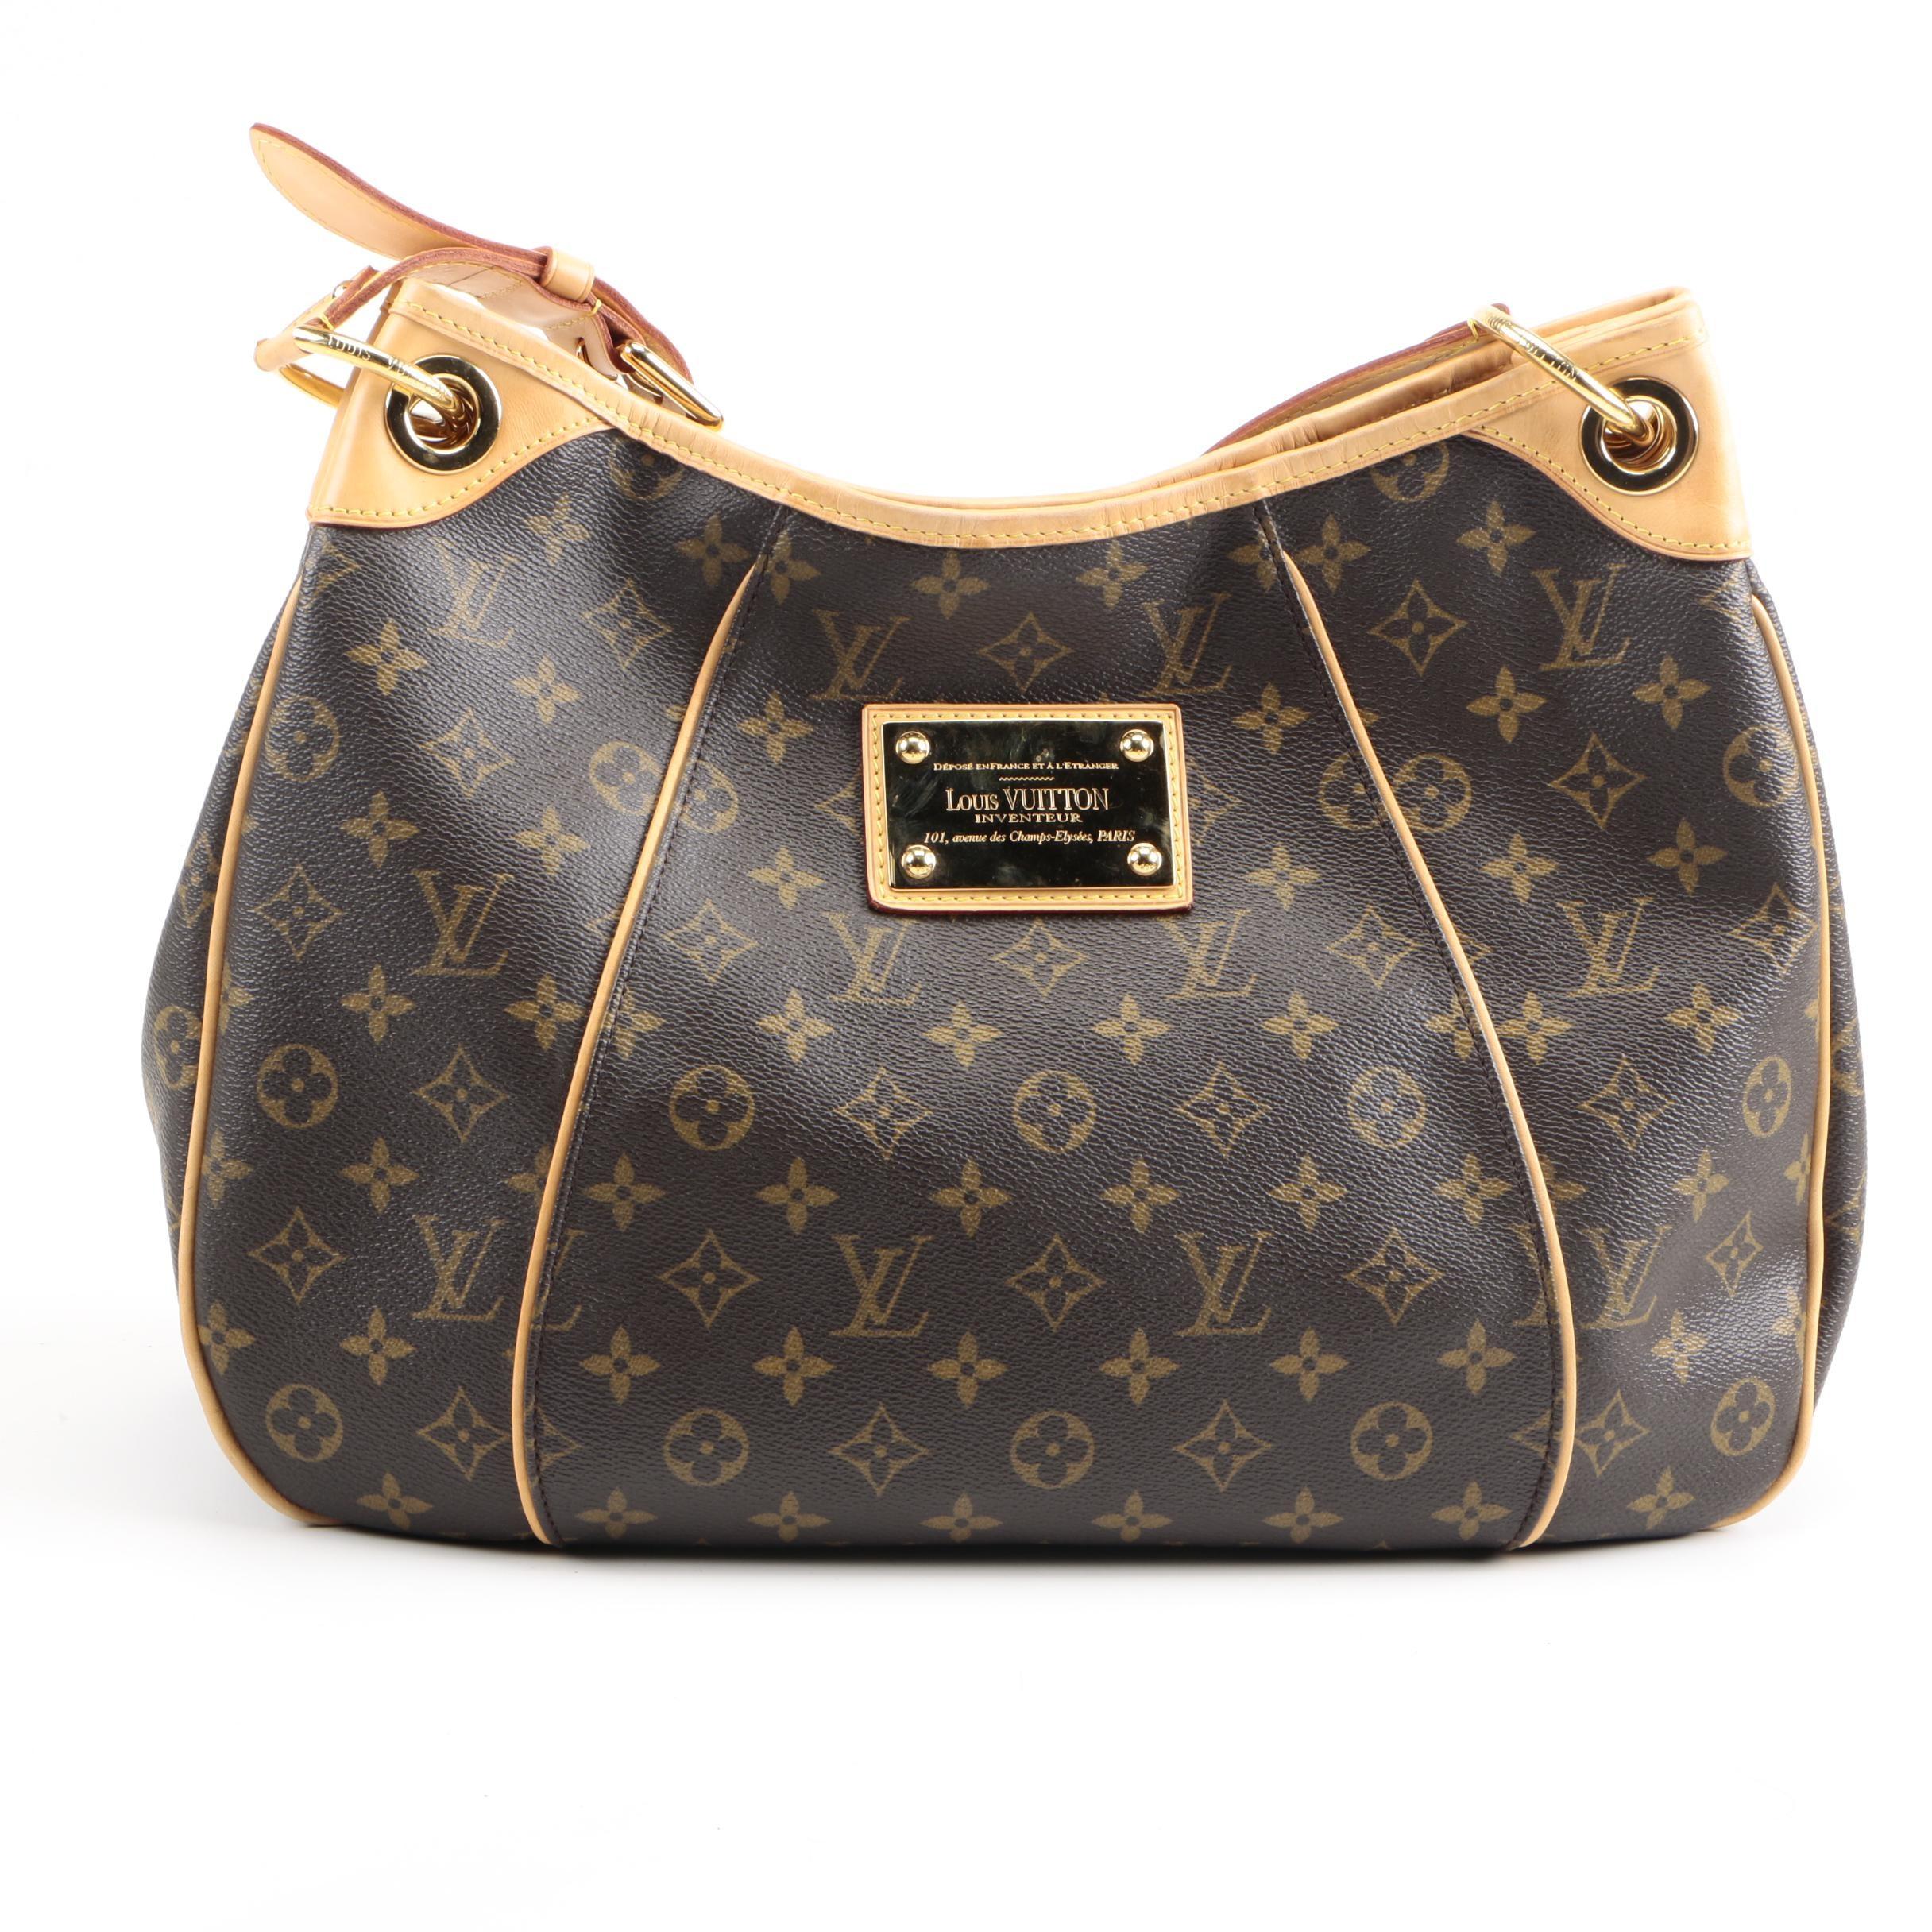 Louis Vuitton Inventeur Galliera Handbag